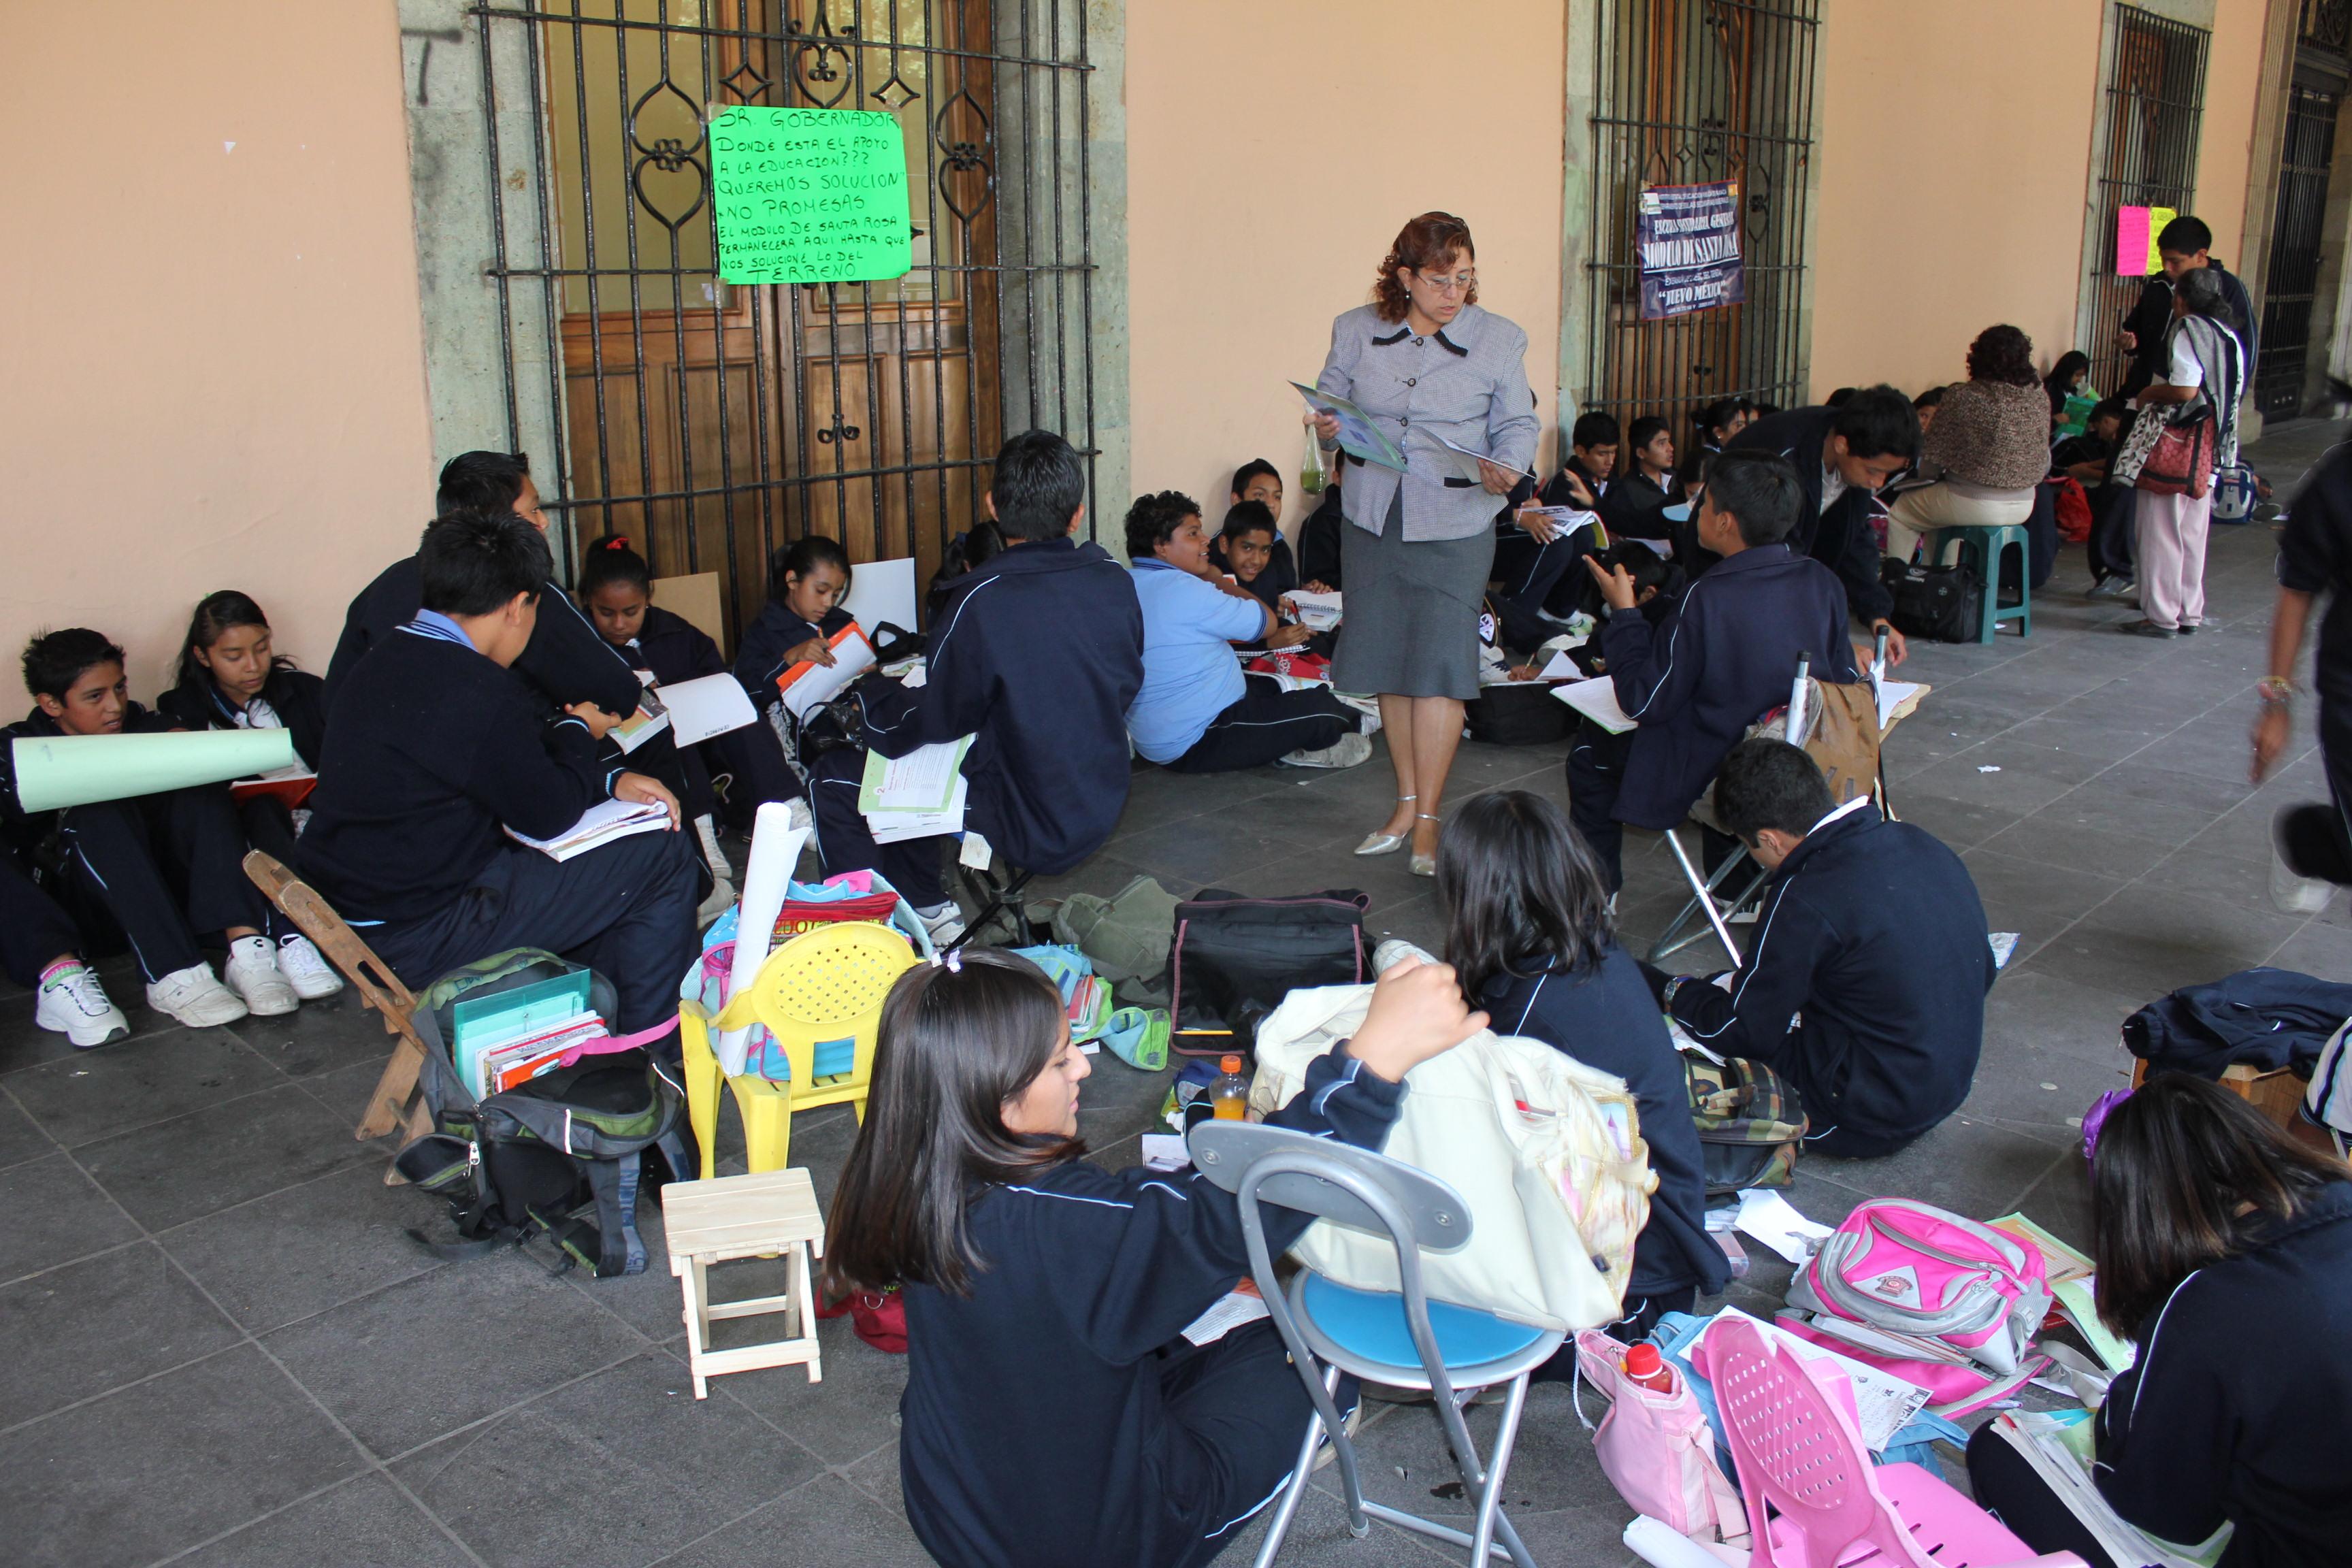 J venes opinan sobre la educaci n en m xico baccalaureat for Educacion exterior marruecos